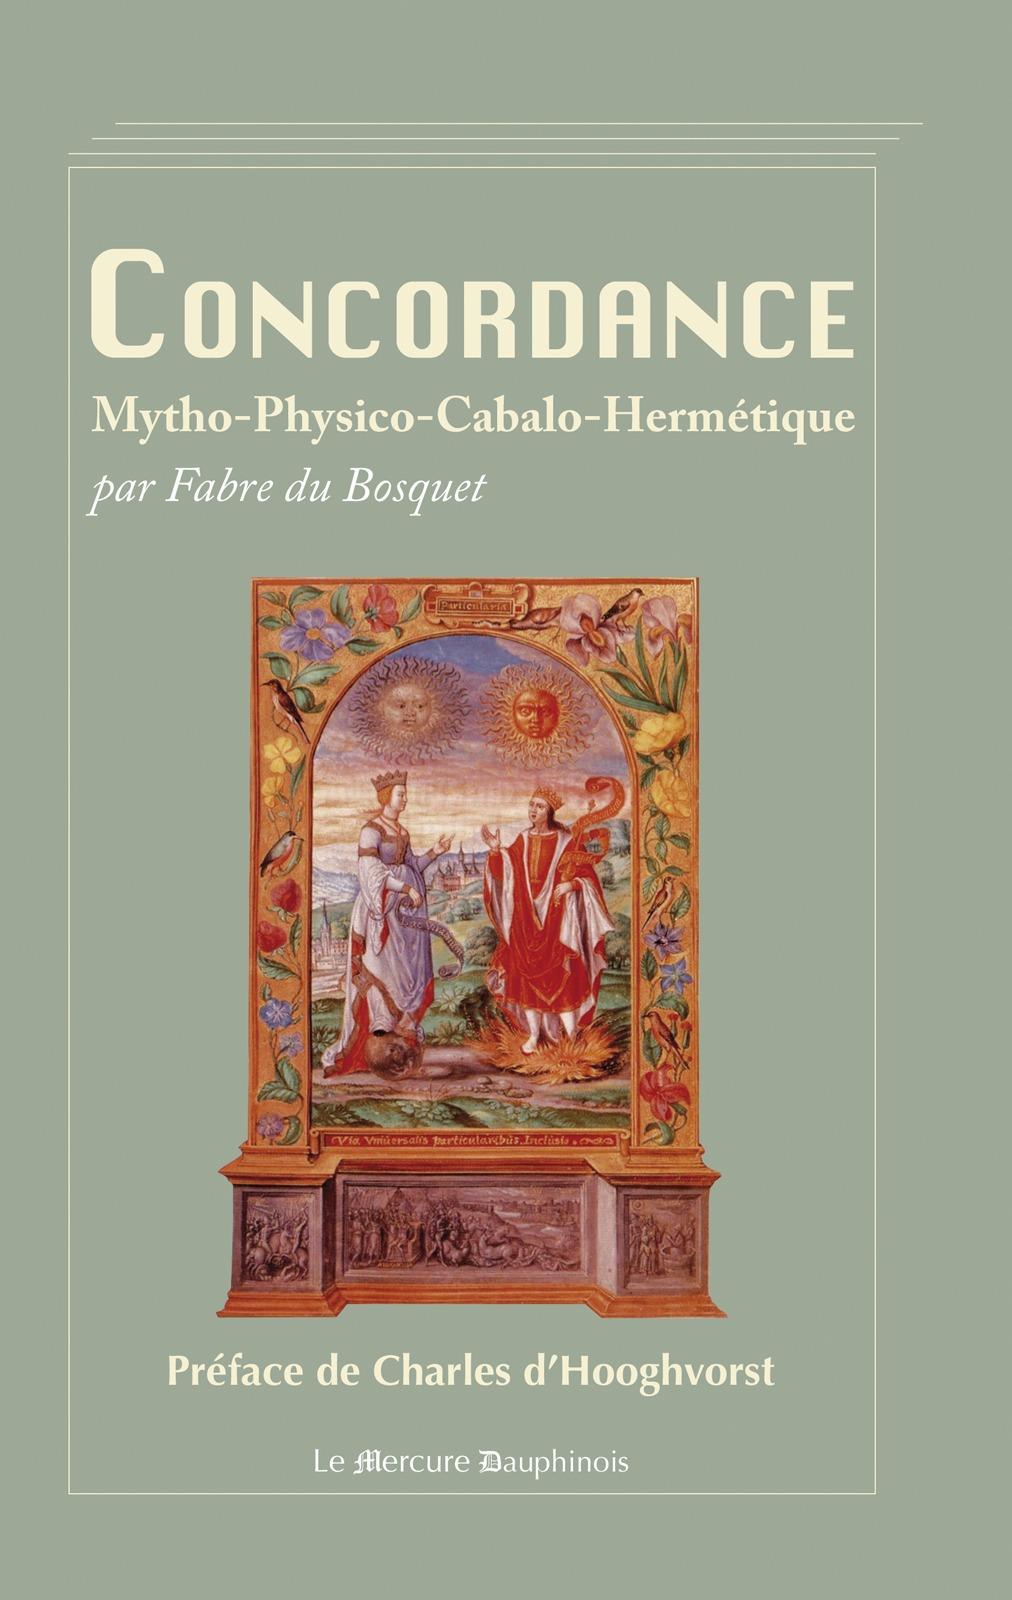 Fabre du Bosquet Concordance Mytho-Physico-Cabalo-Hermétique